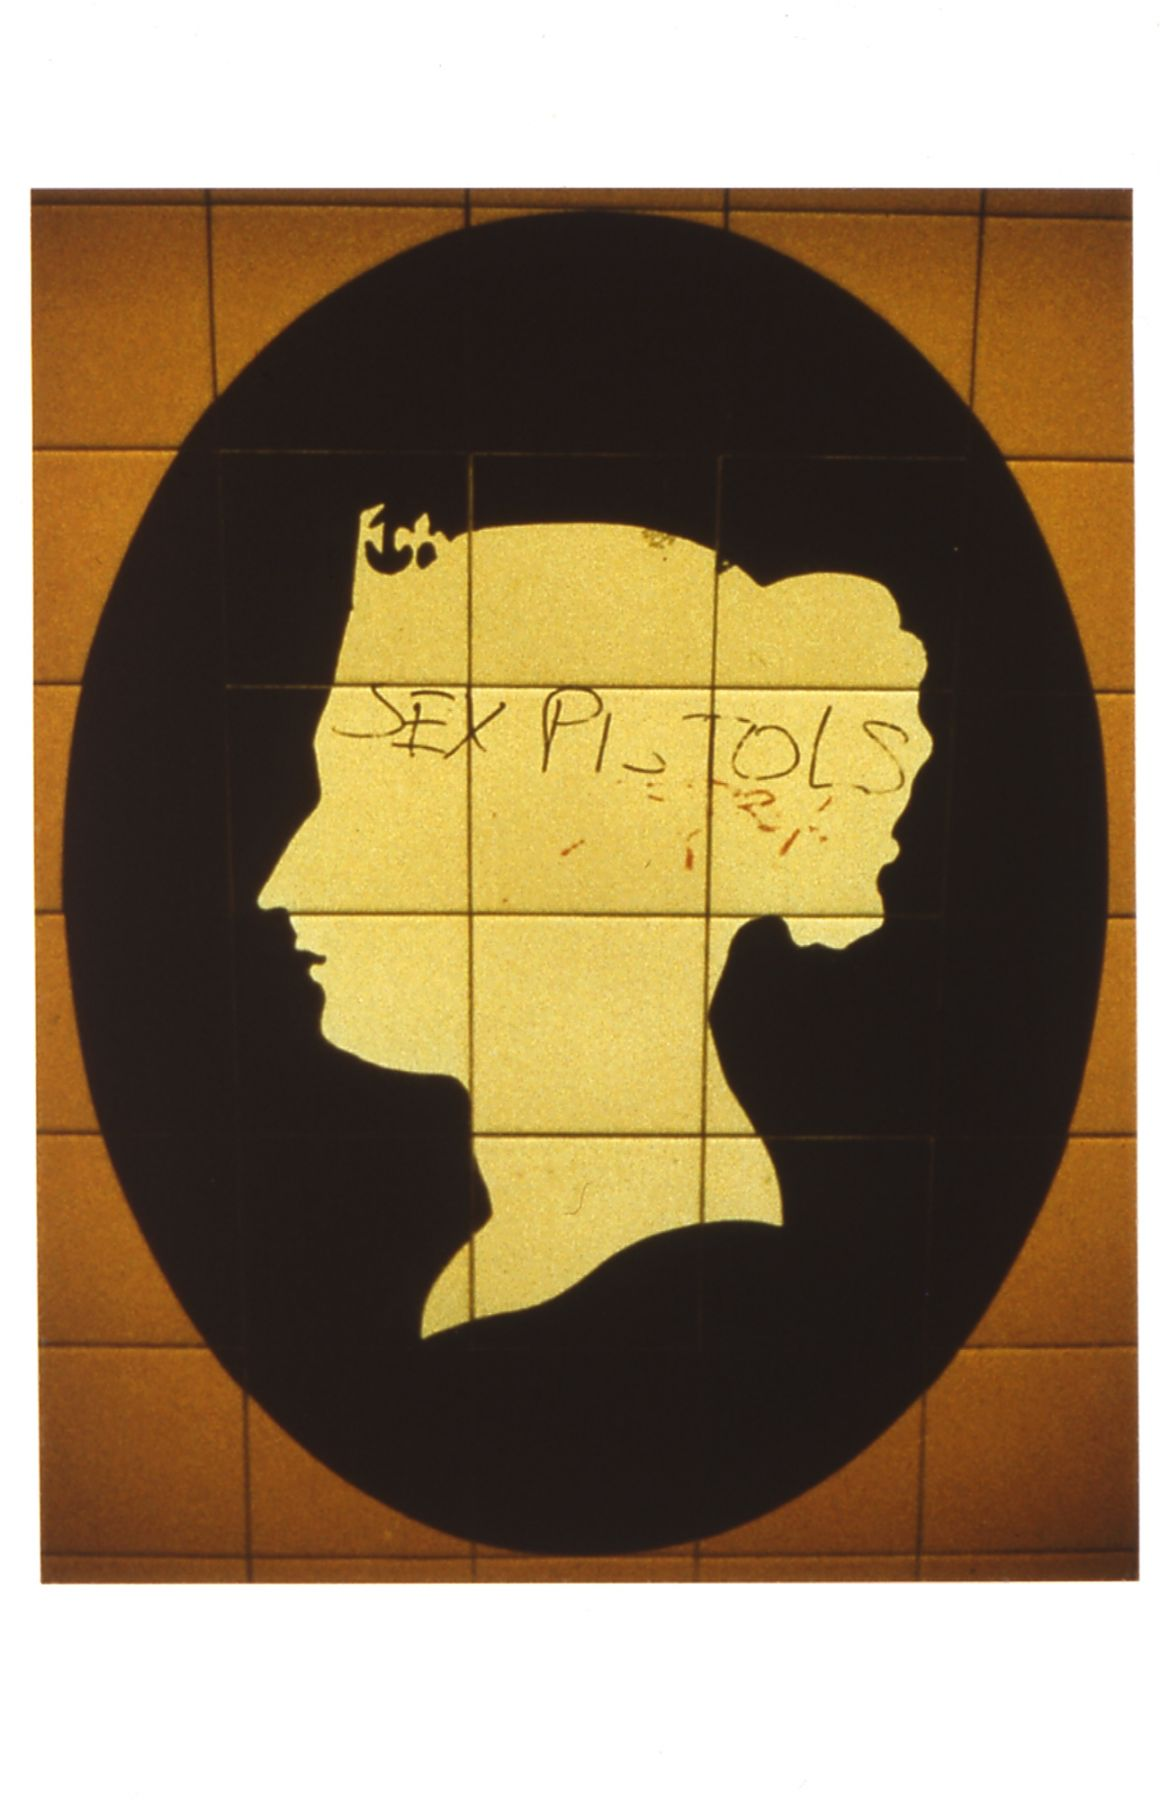 Sex Pistols, 1979 - 2007, C-print